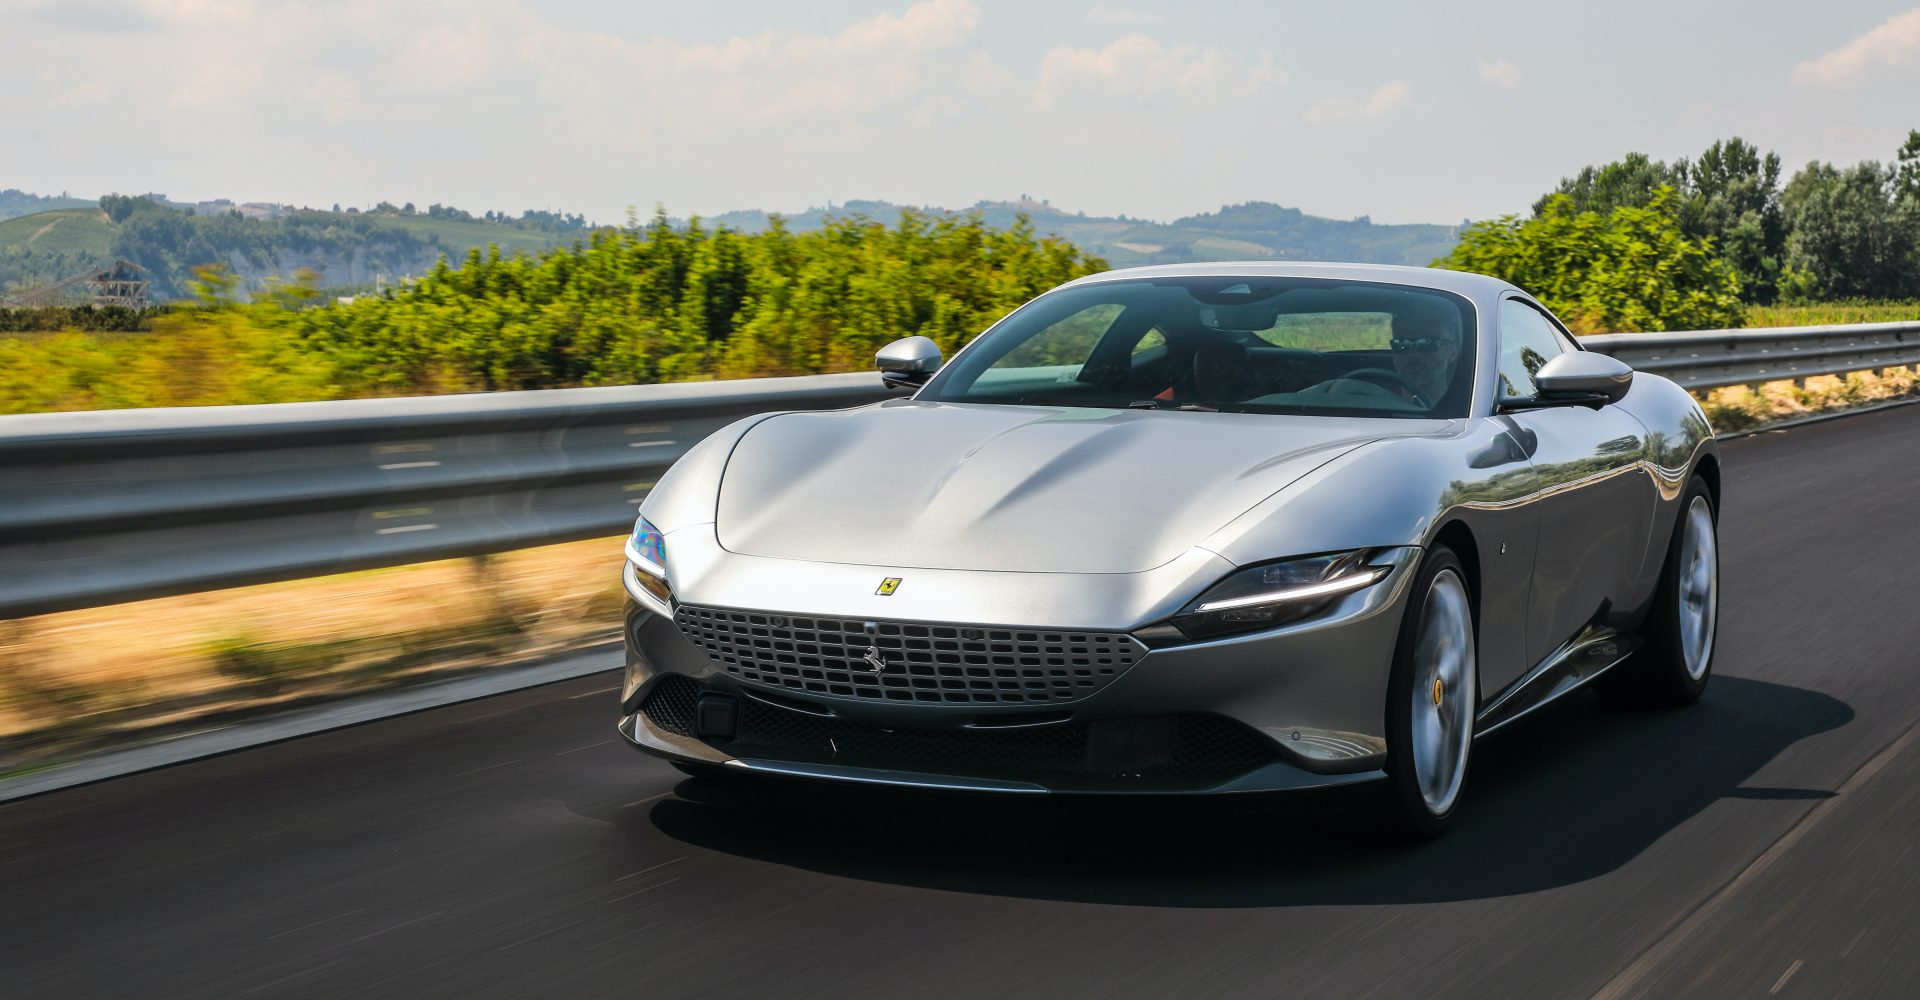 First Drive: The Ferrari Roma arrives to revolutionise the GT segment